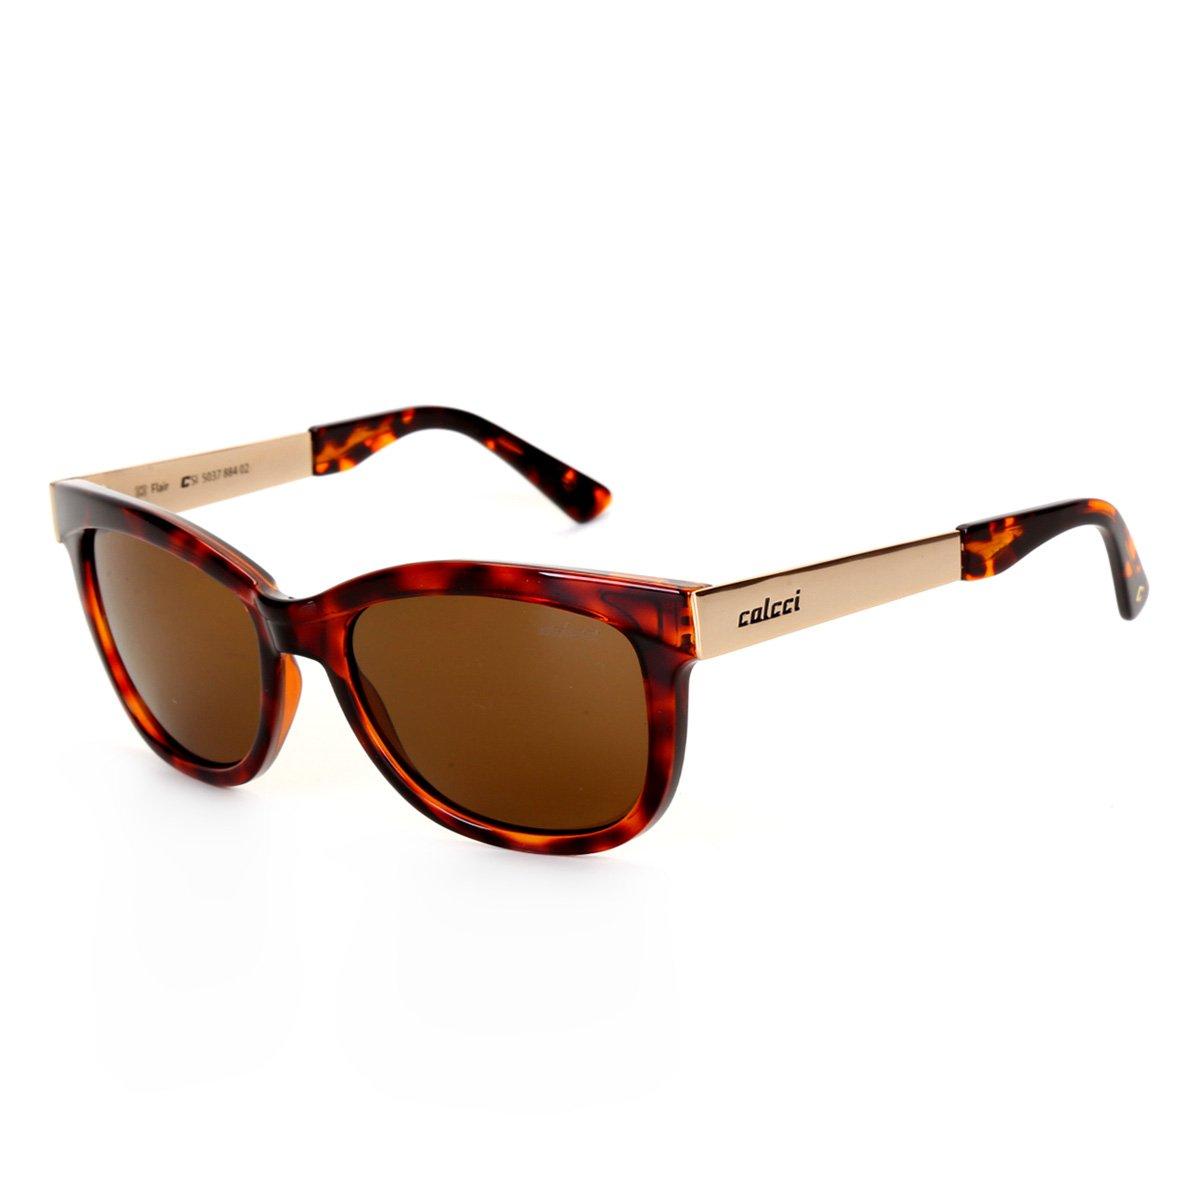 Óculos De Sol Colcci Flair 503788402 Feminino